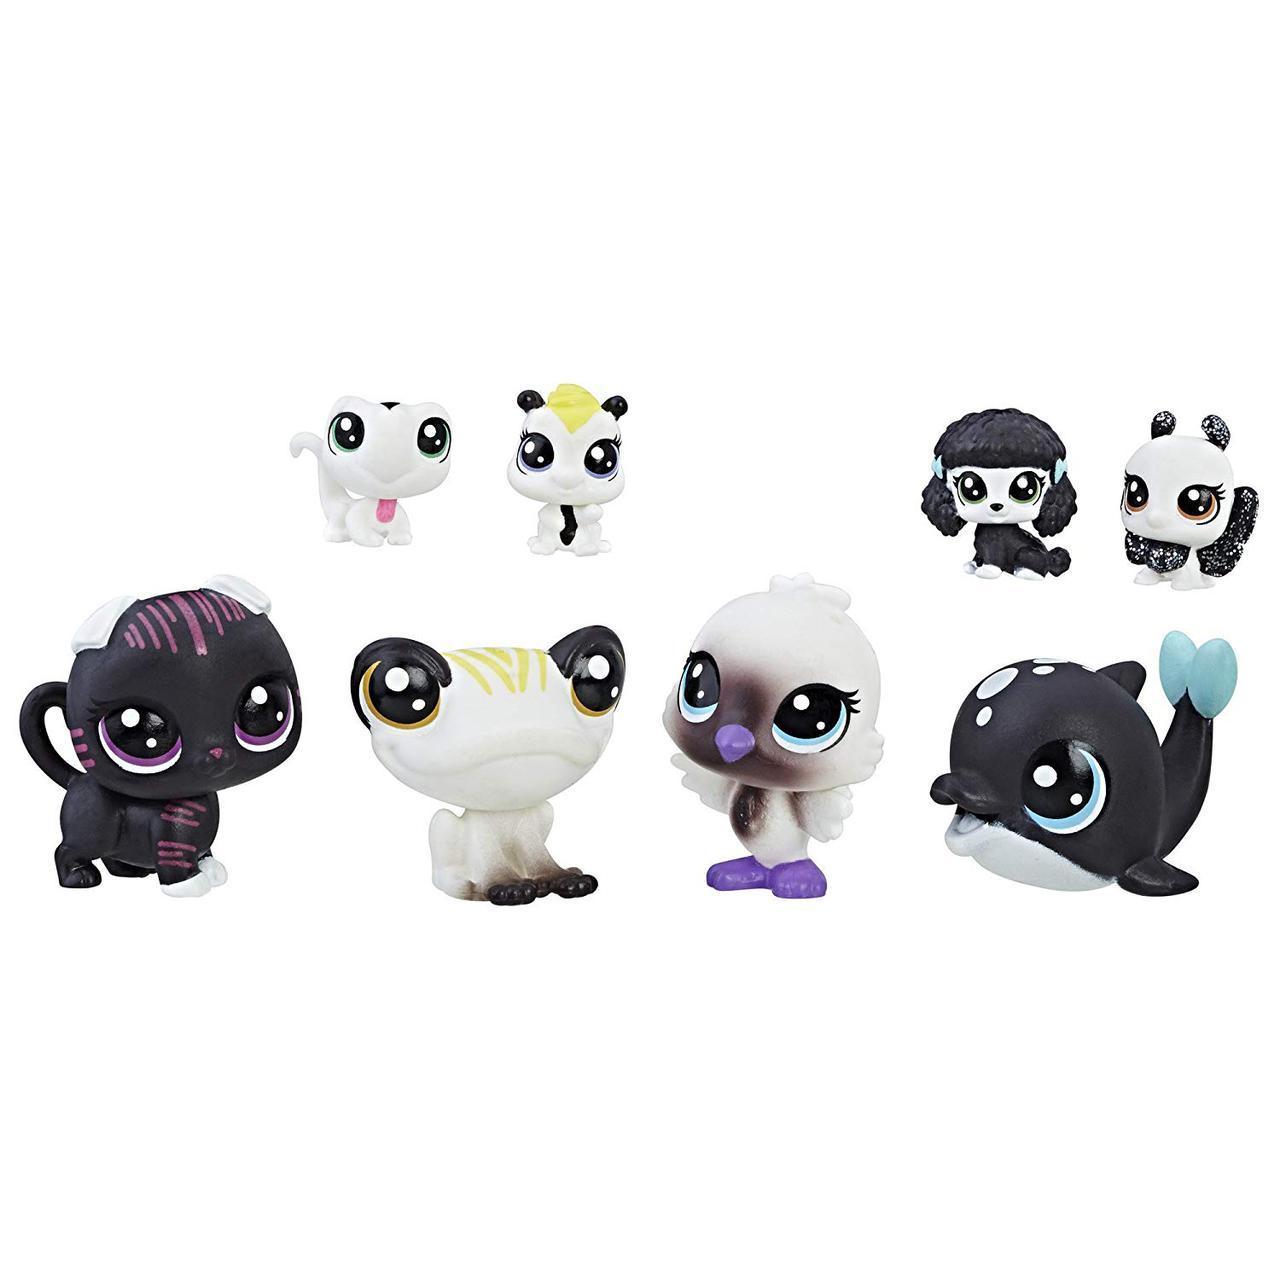 Лител пет шоп набор из 8 ми зверюшек черно - белая серия Littlest Pet Shop Black & White Pet Friends